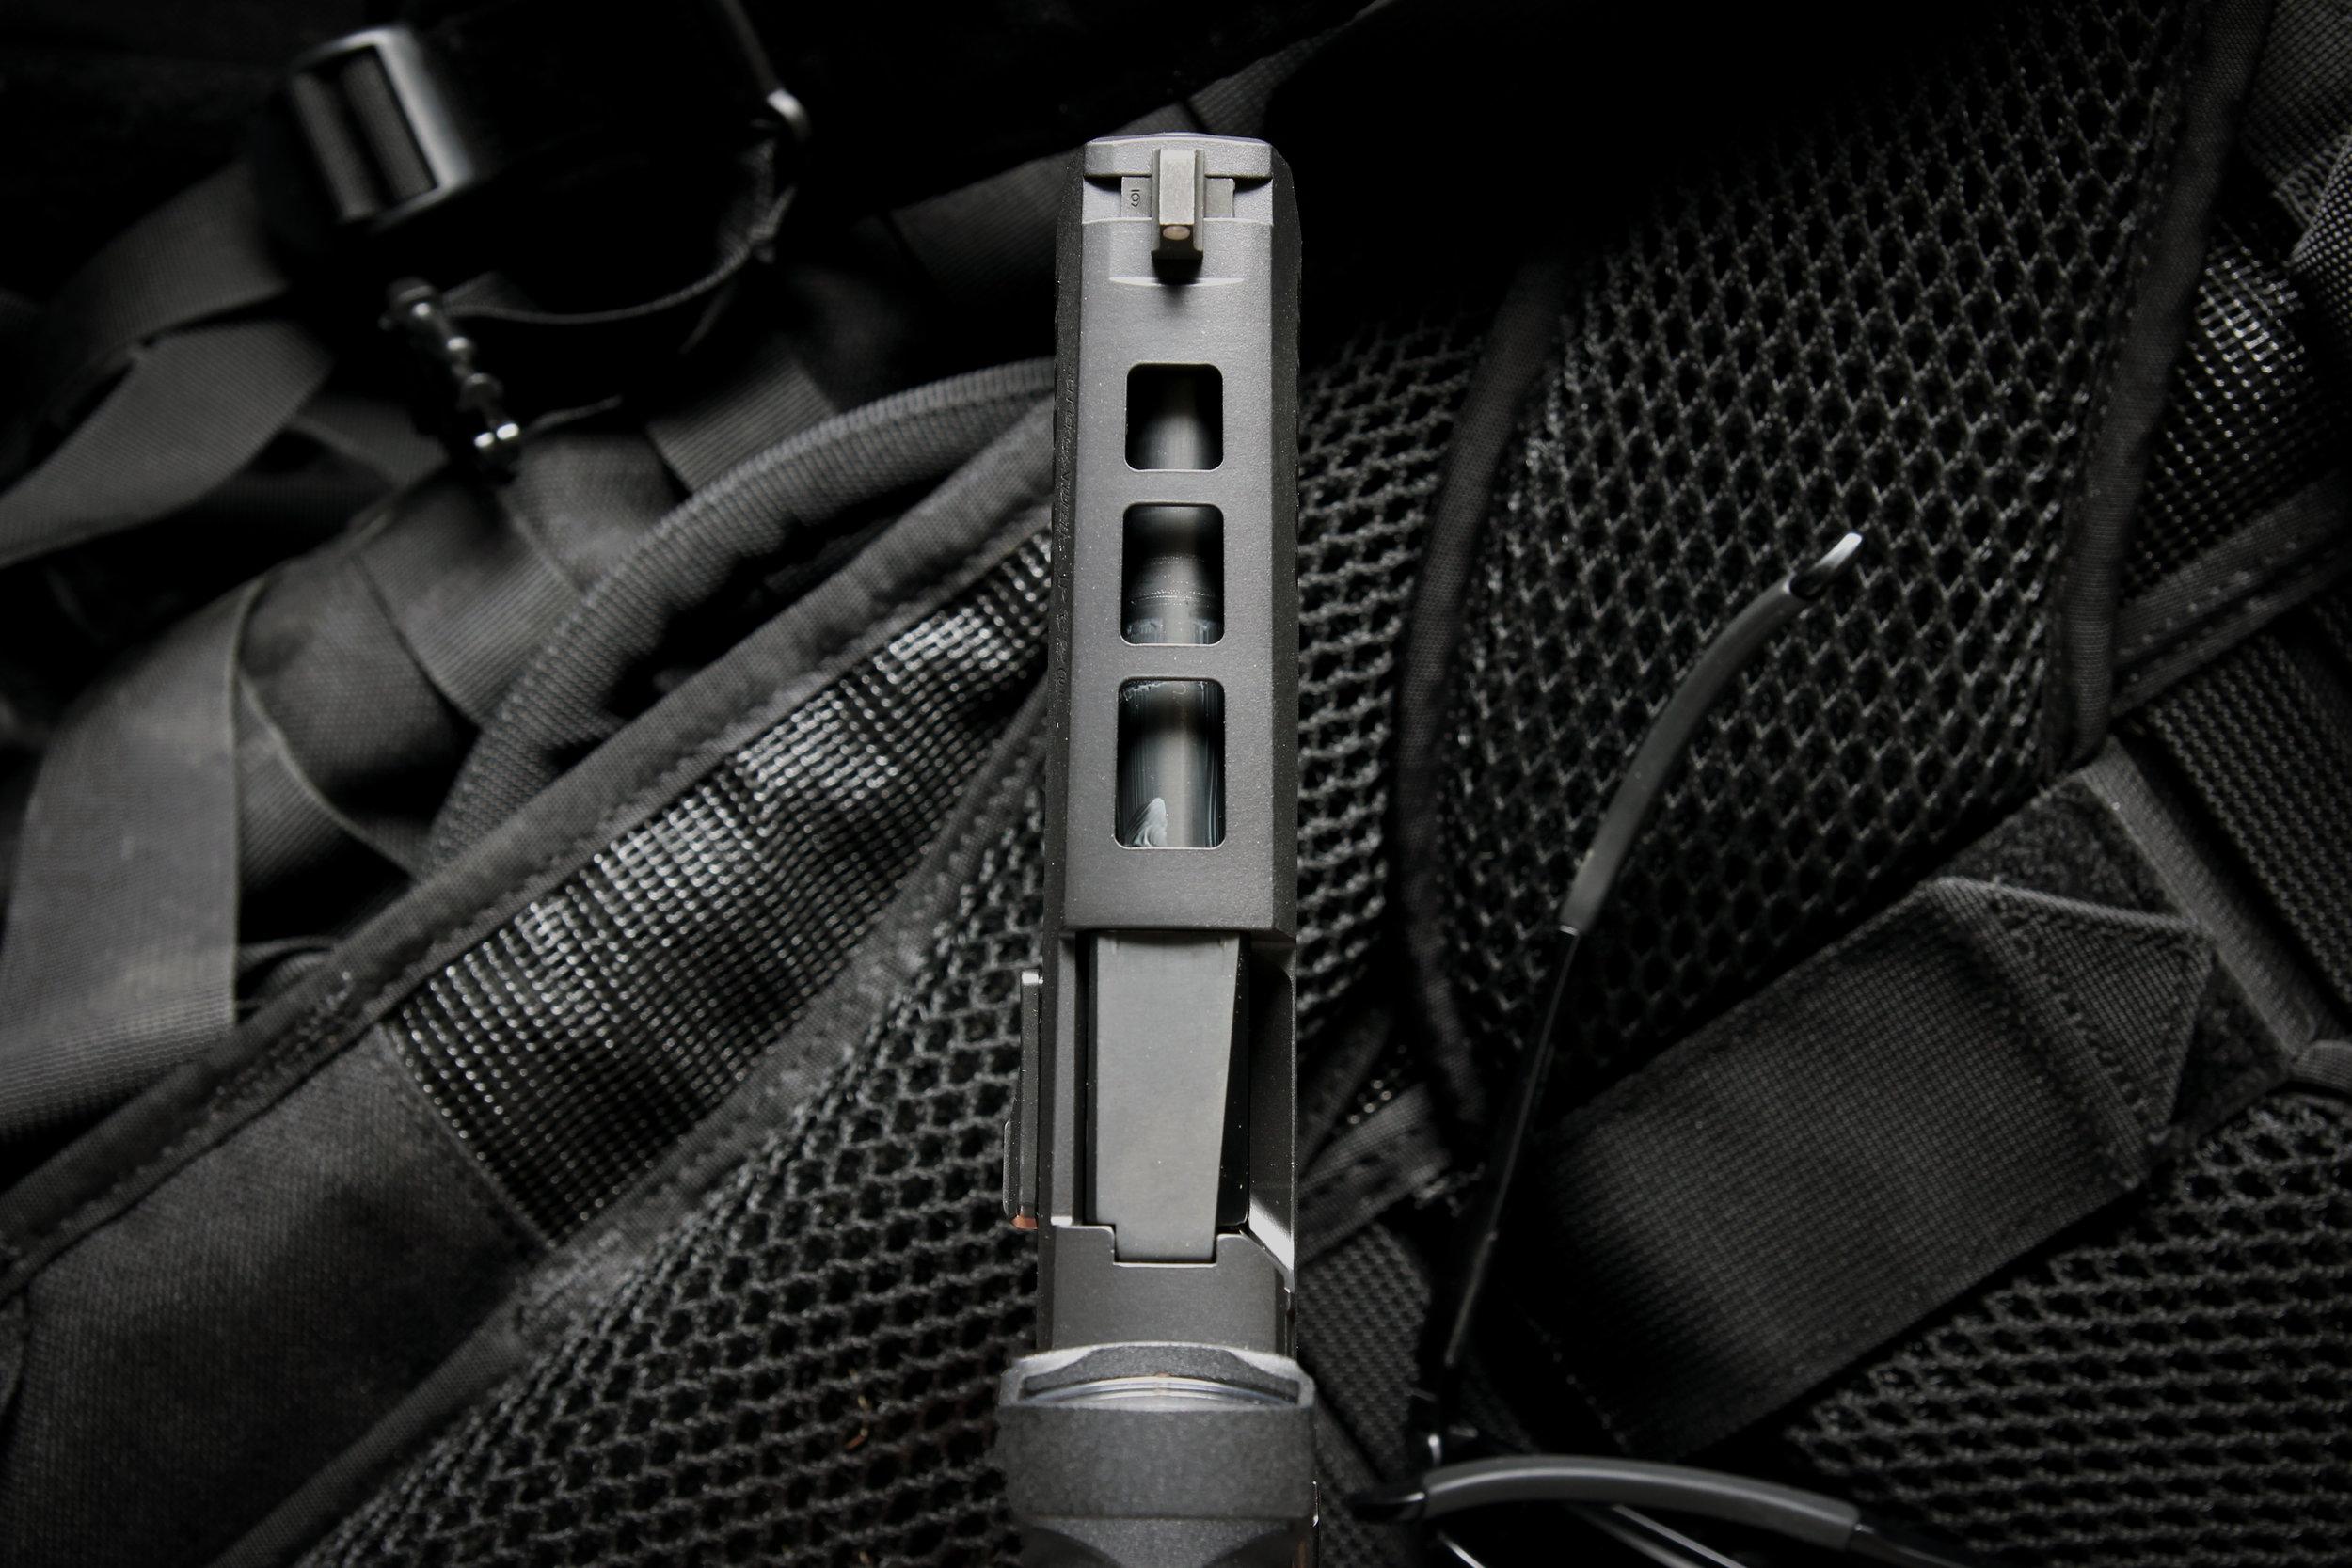 tri port p320 top lightening cut black box customs